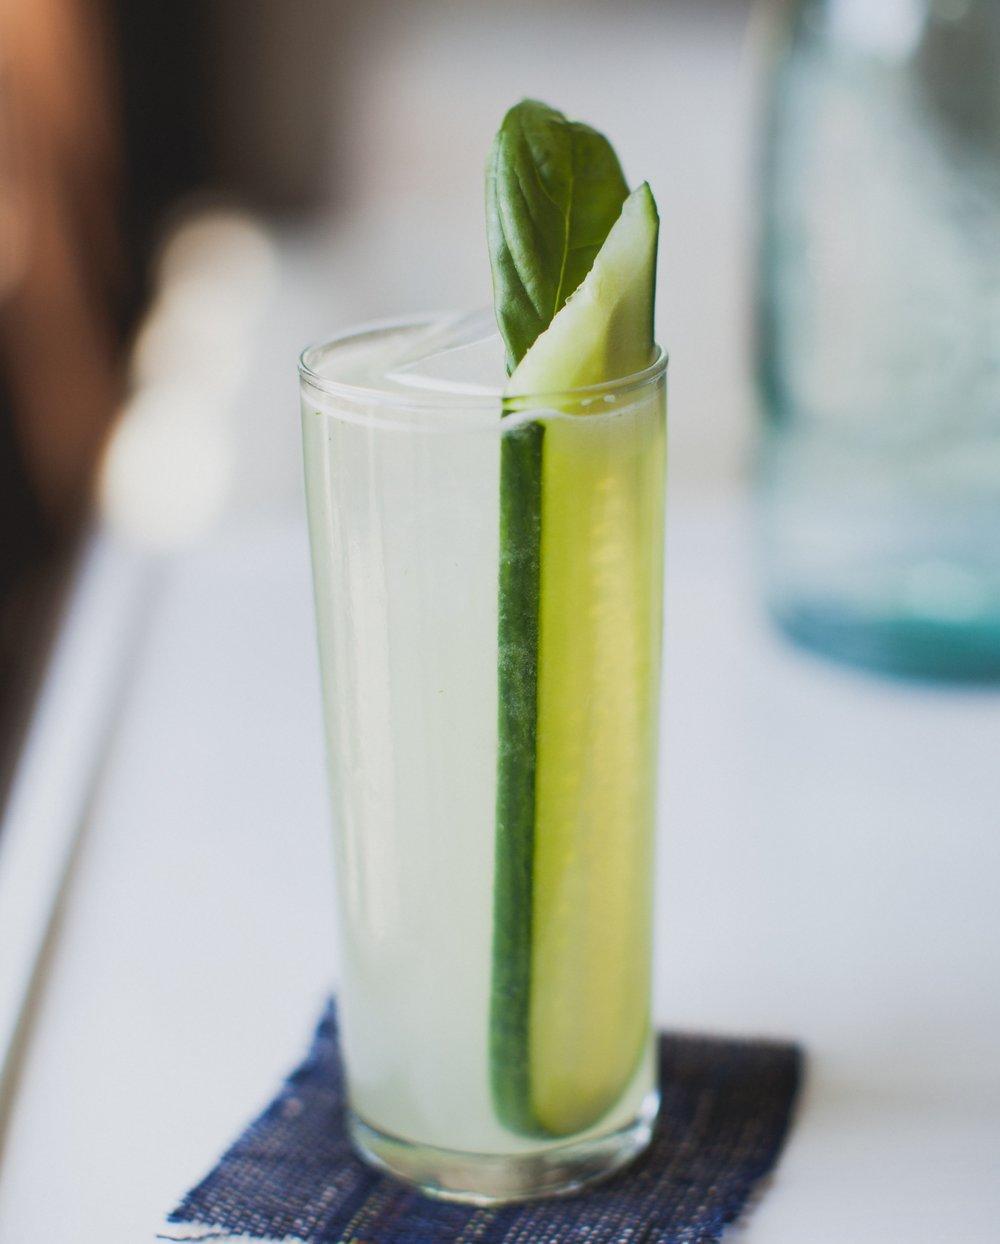 longcucumber.jpg